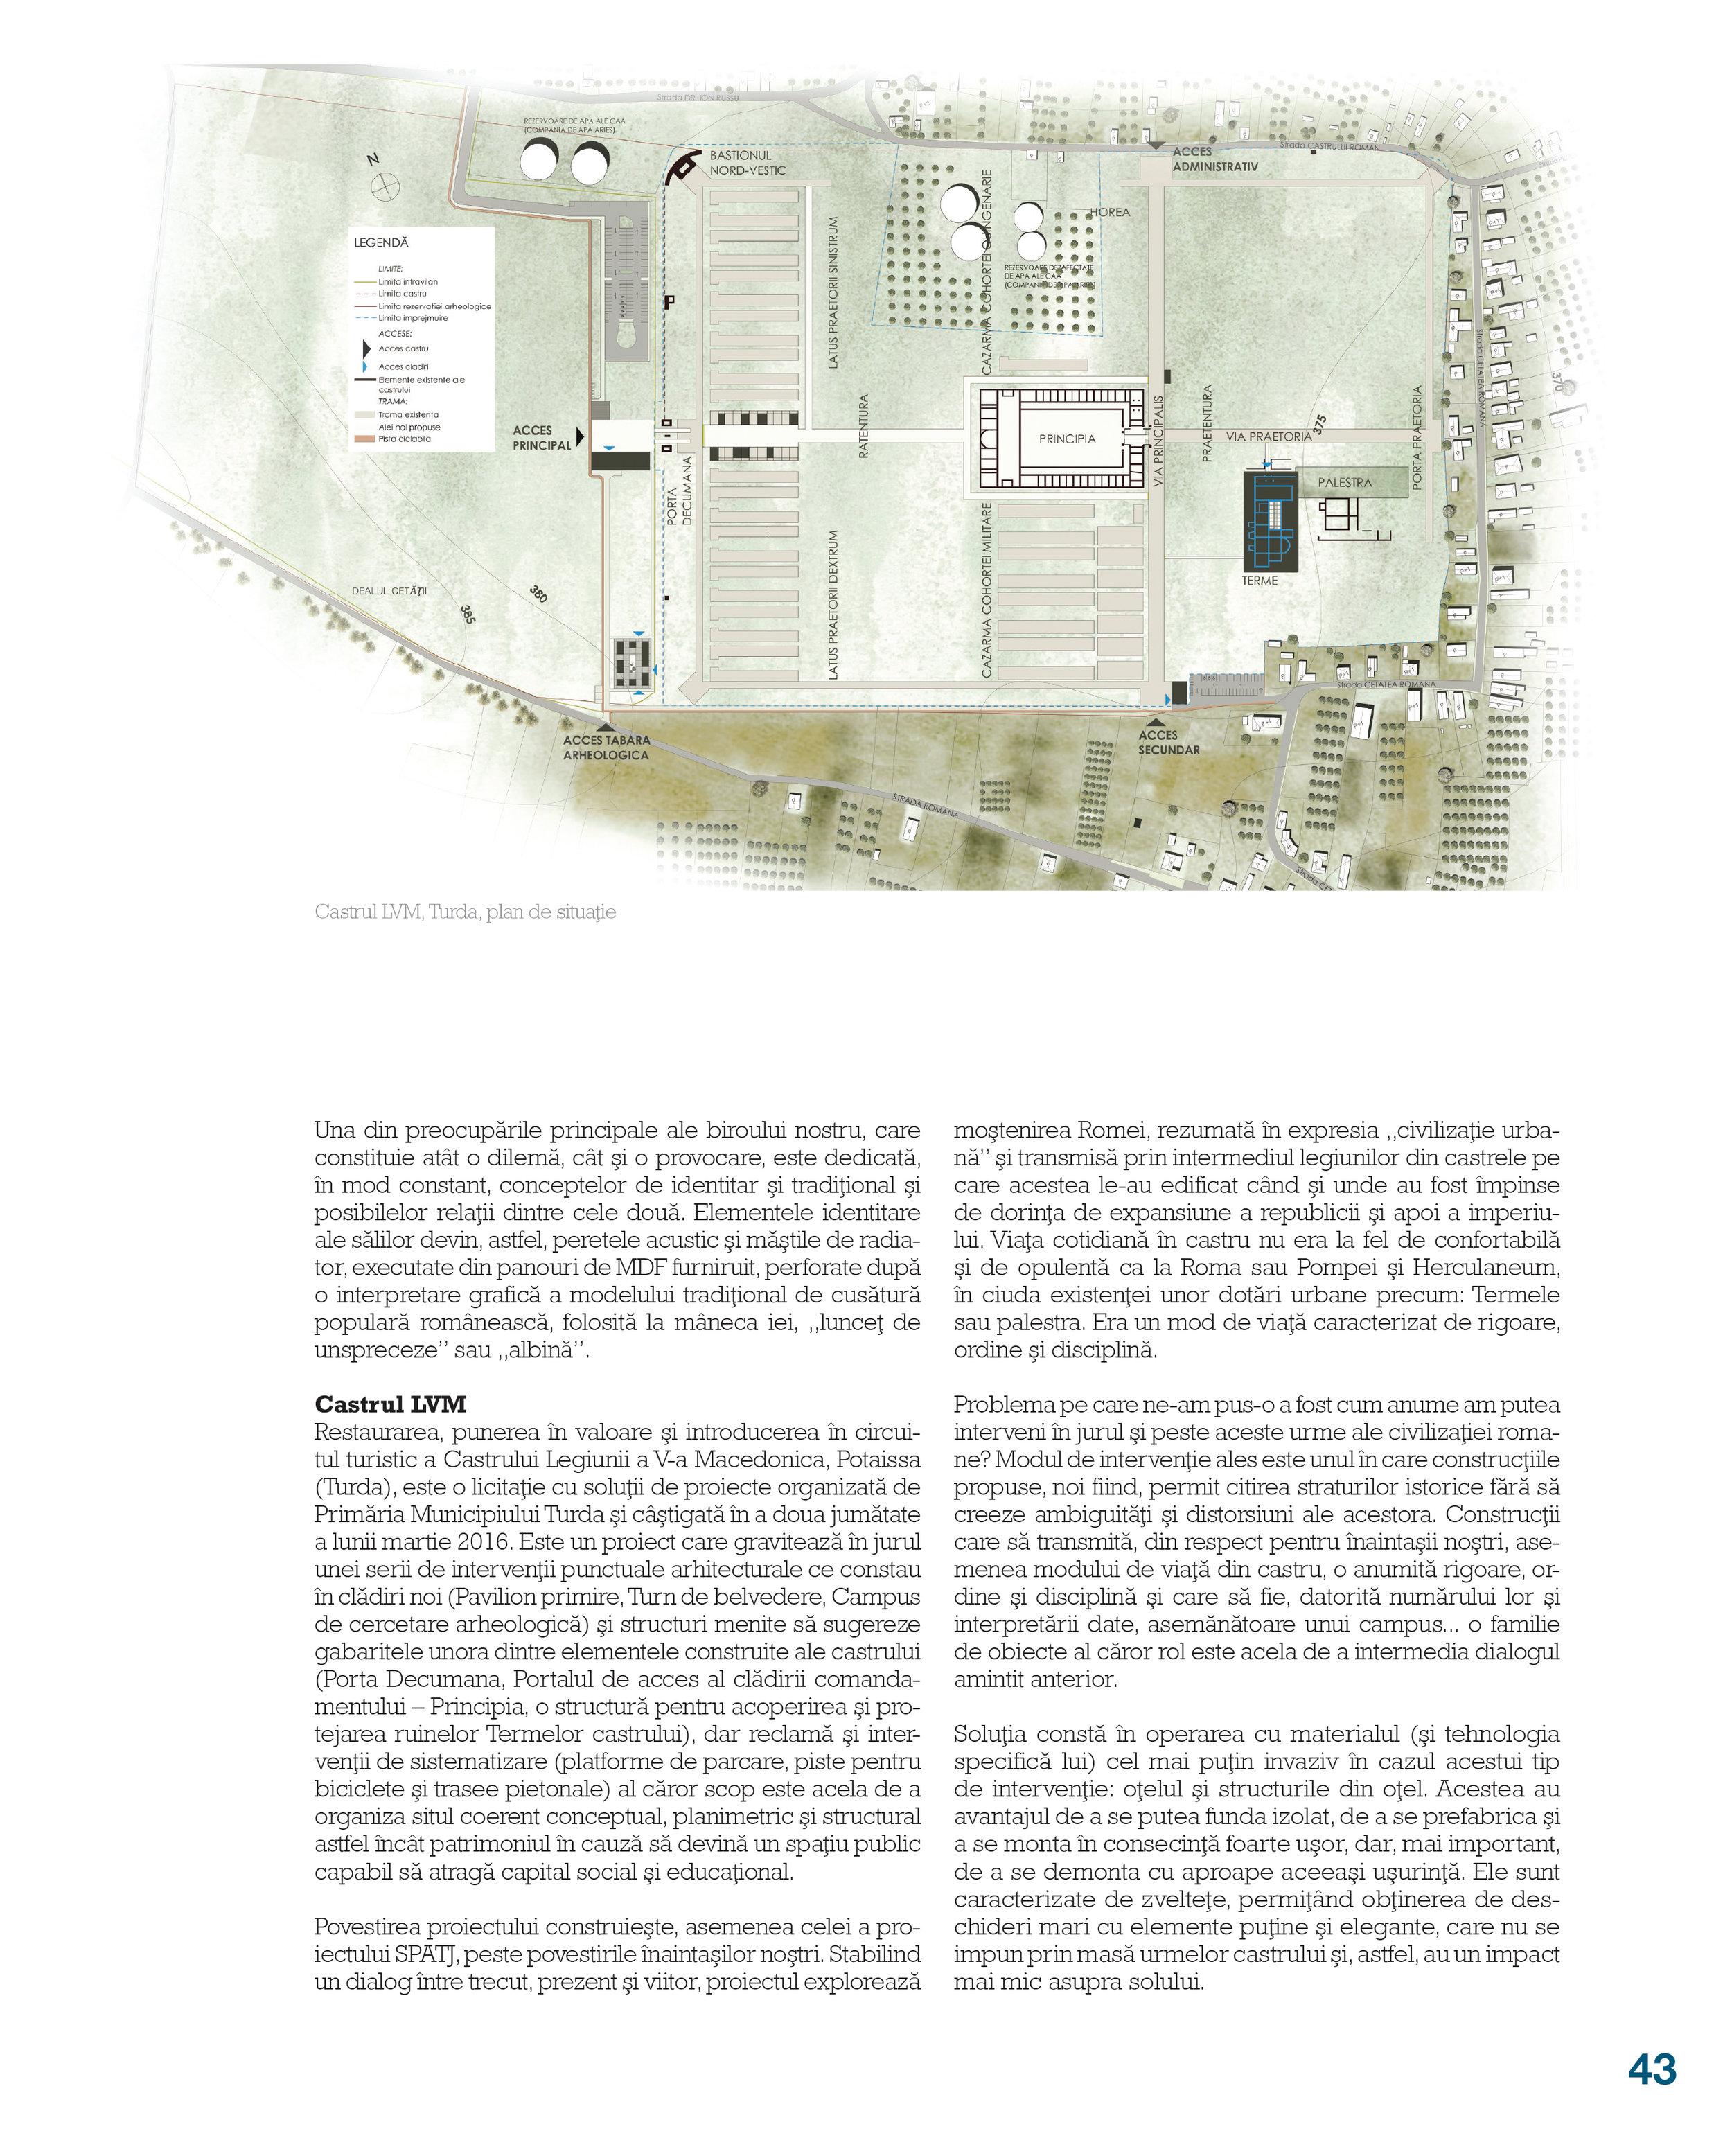 6_Arhitecturi in crestere 4.jpg